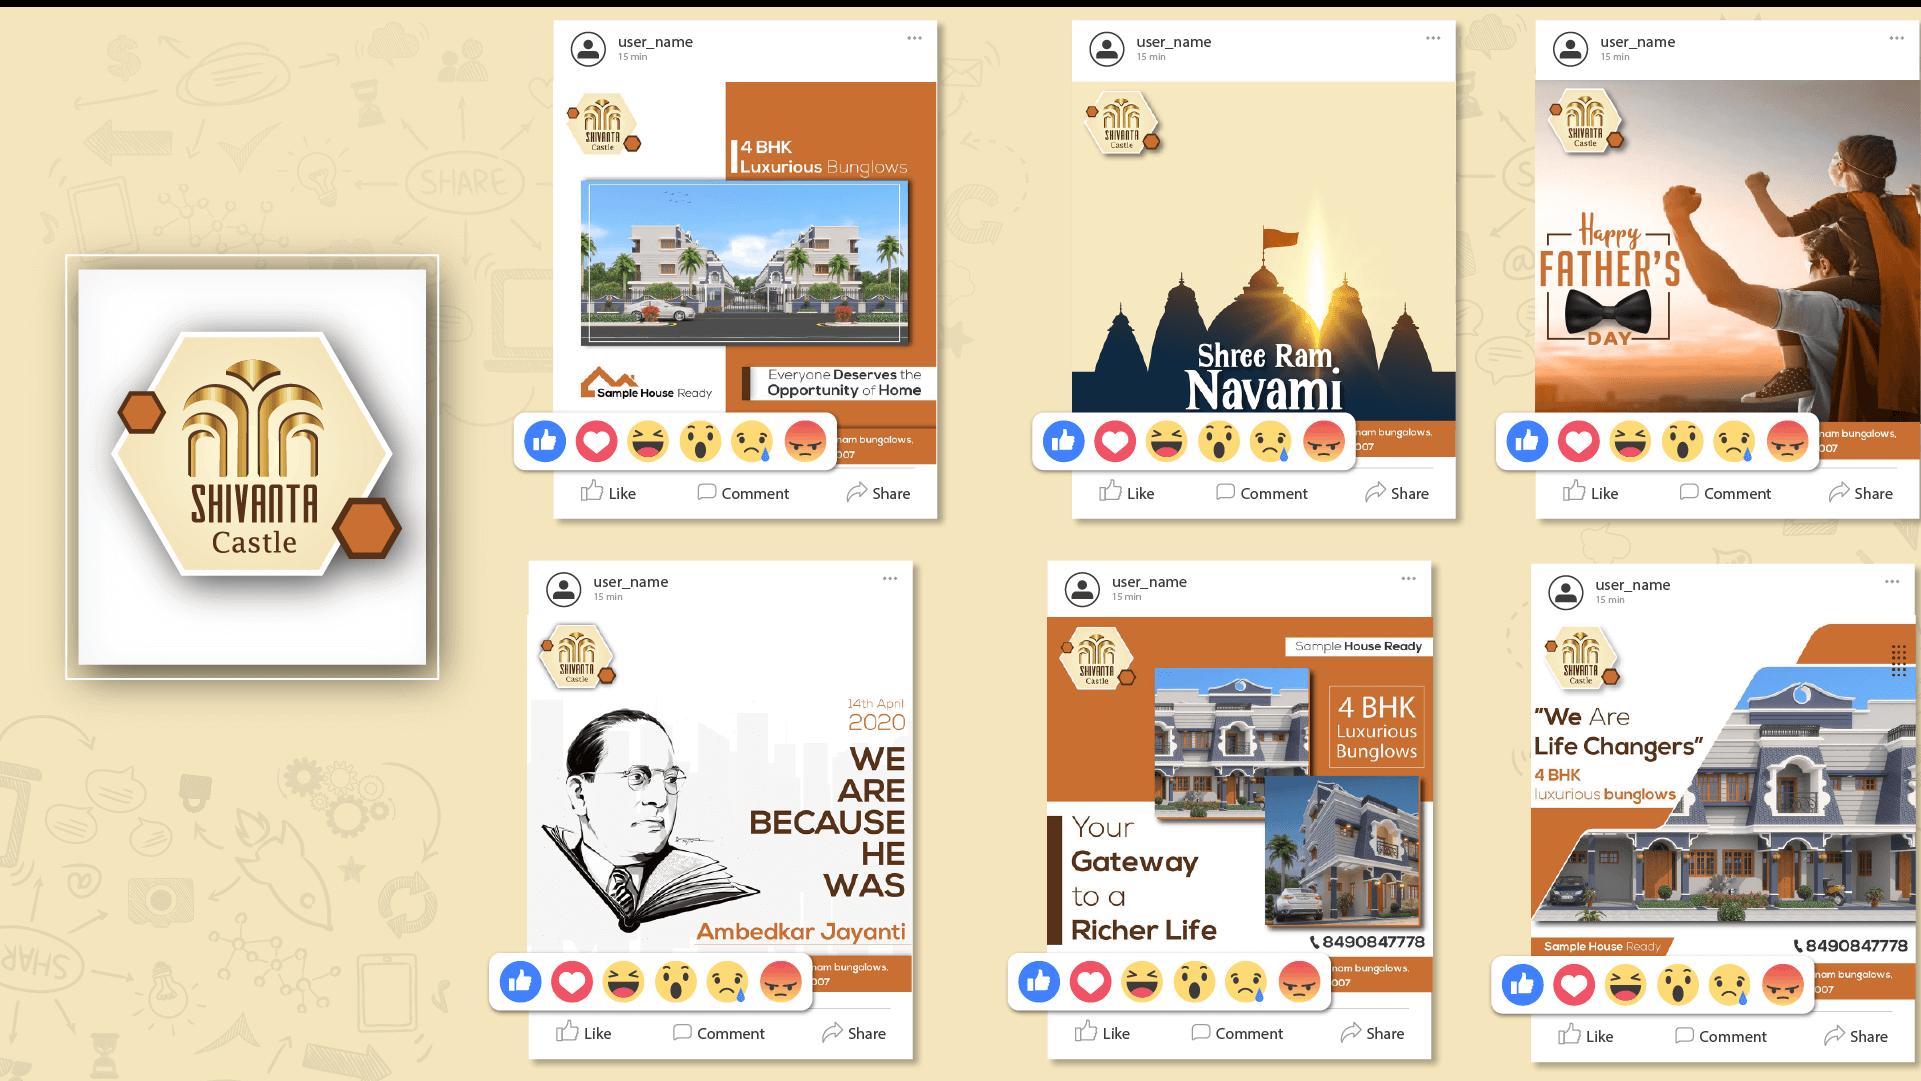 Shivanta Castle Social Media Creative